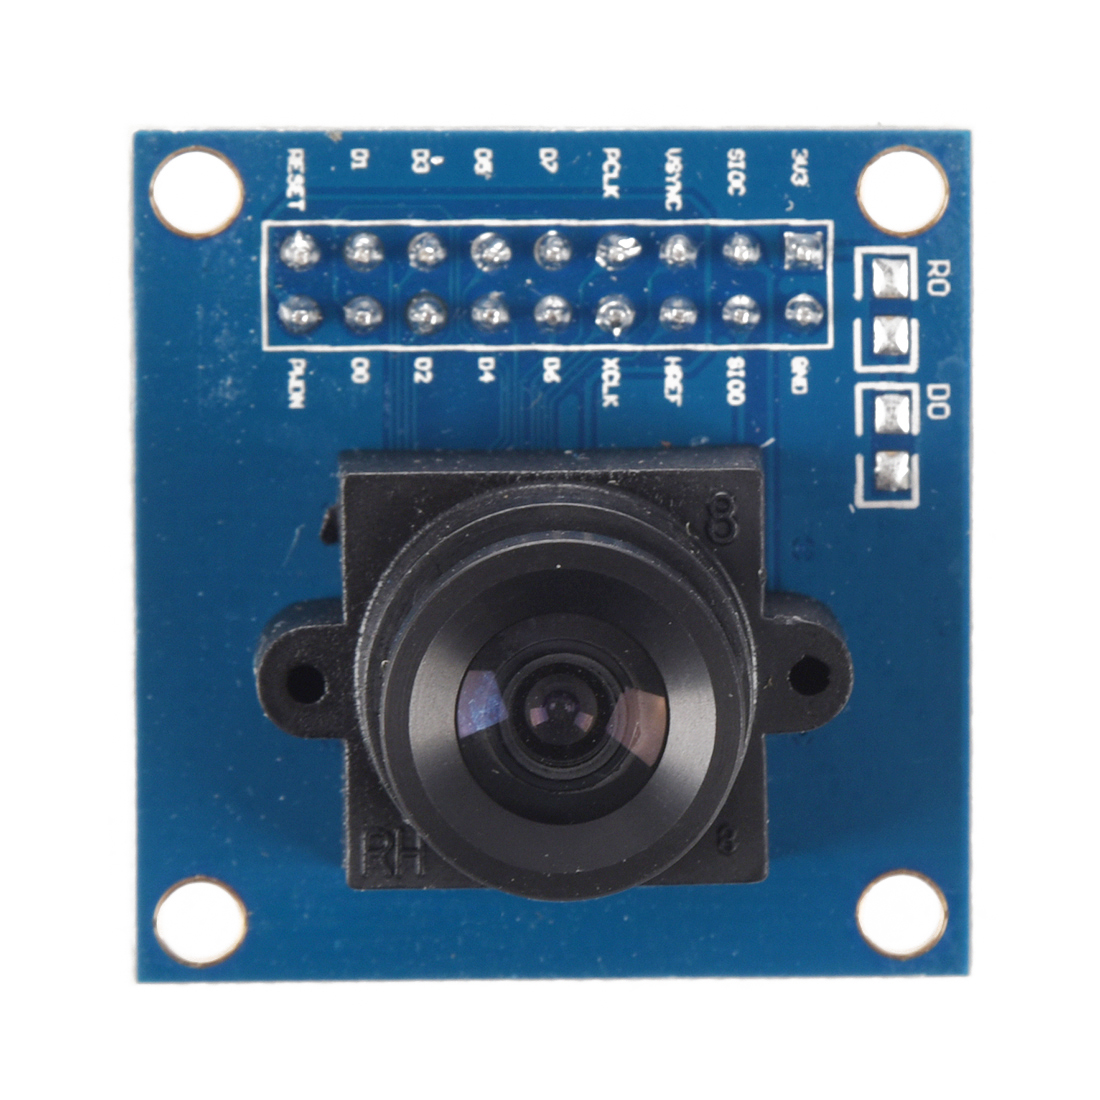 MOOL  640 X 480 CMOS OV7670 Camera Module With High Quality Lens